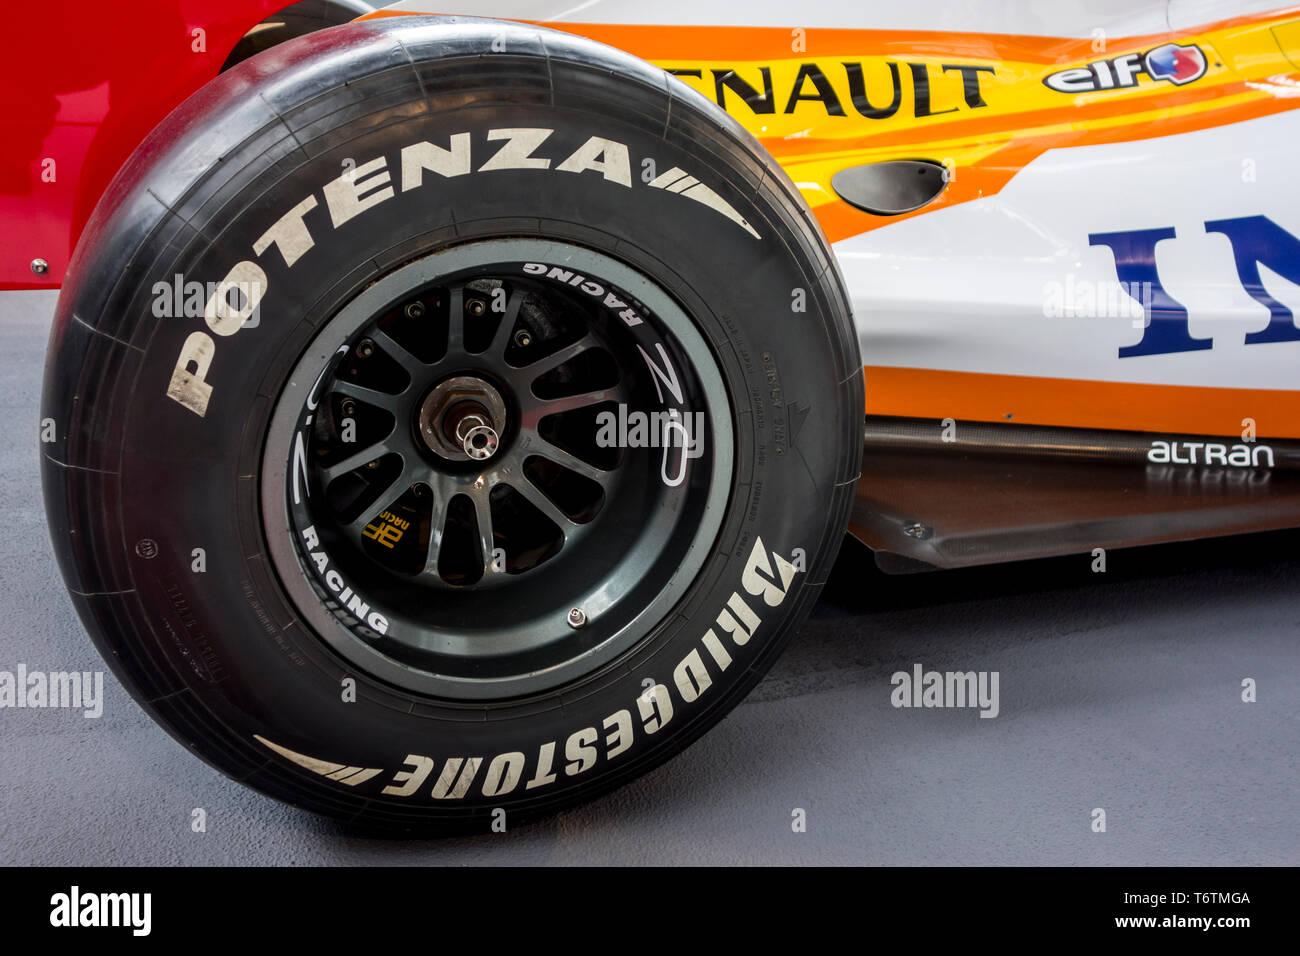 Close-up of Bridgestone Potenza F1 rear racing slick tyre / tire on Renault R28 racing sports car / sports racing car / race car - Stock Image